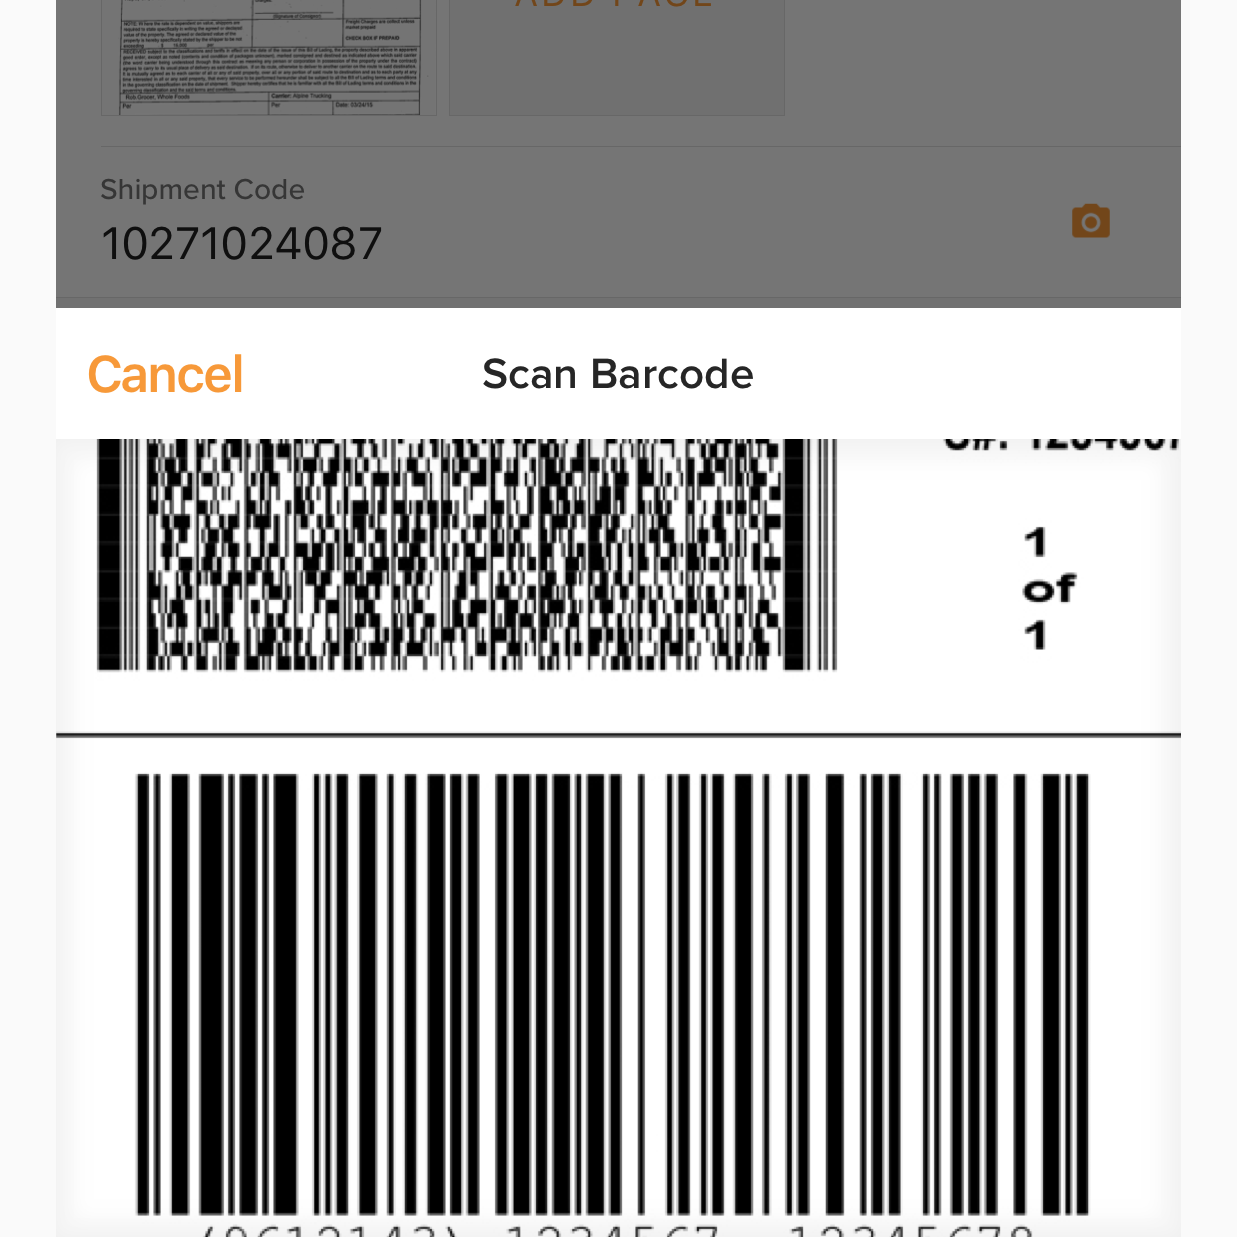 barcode QR code scanning